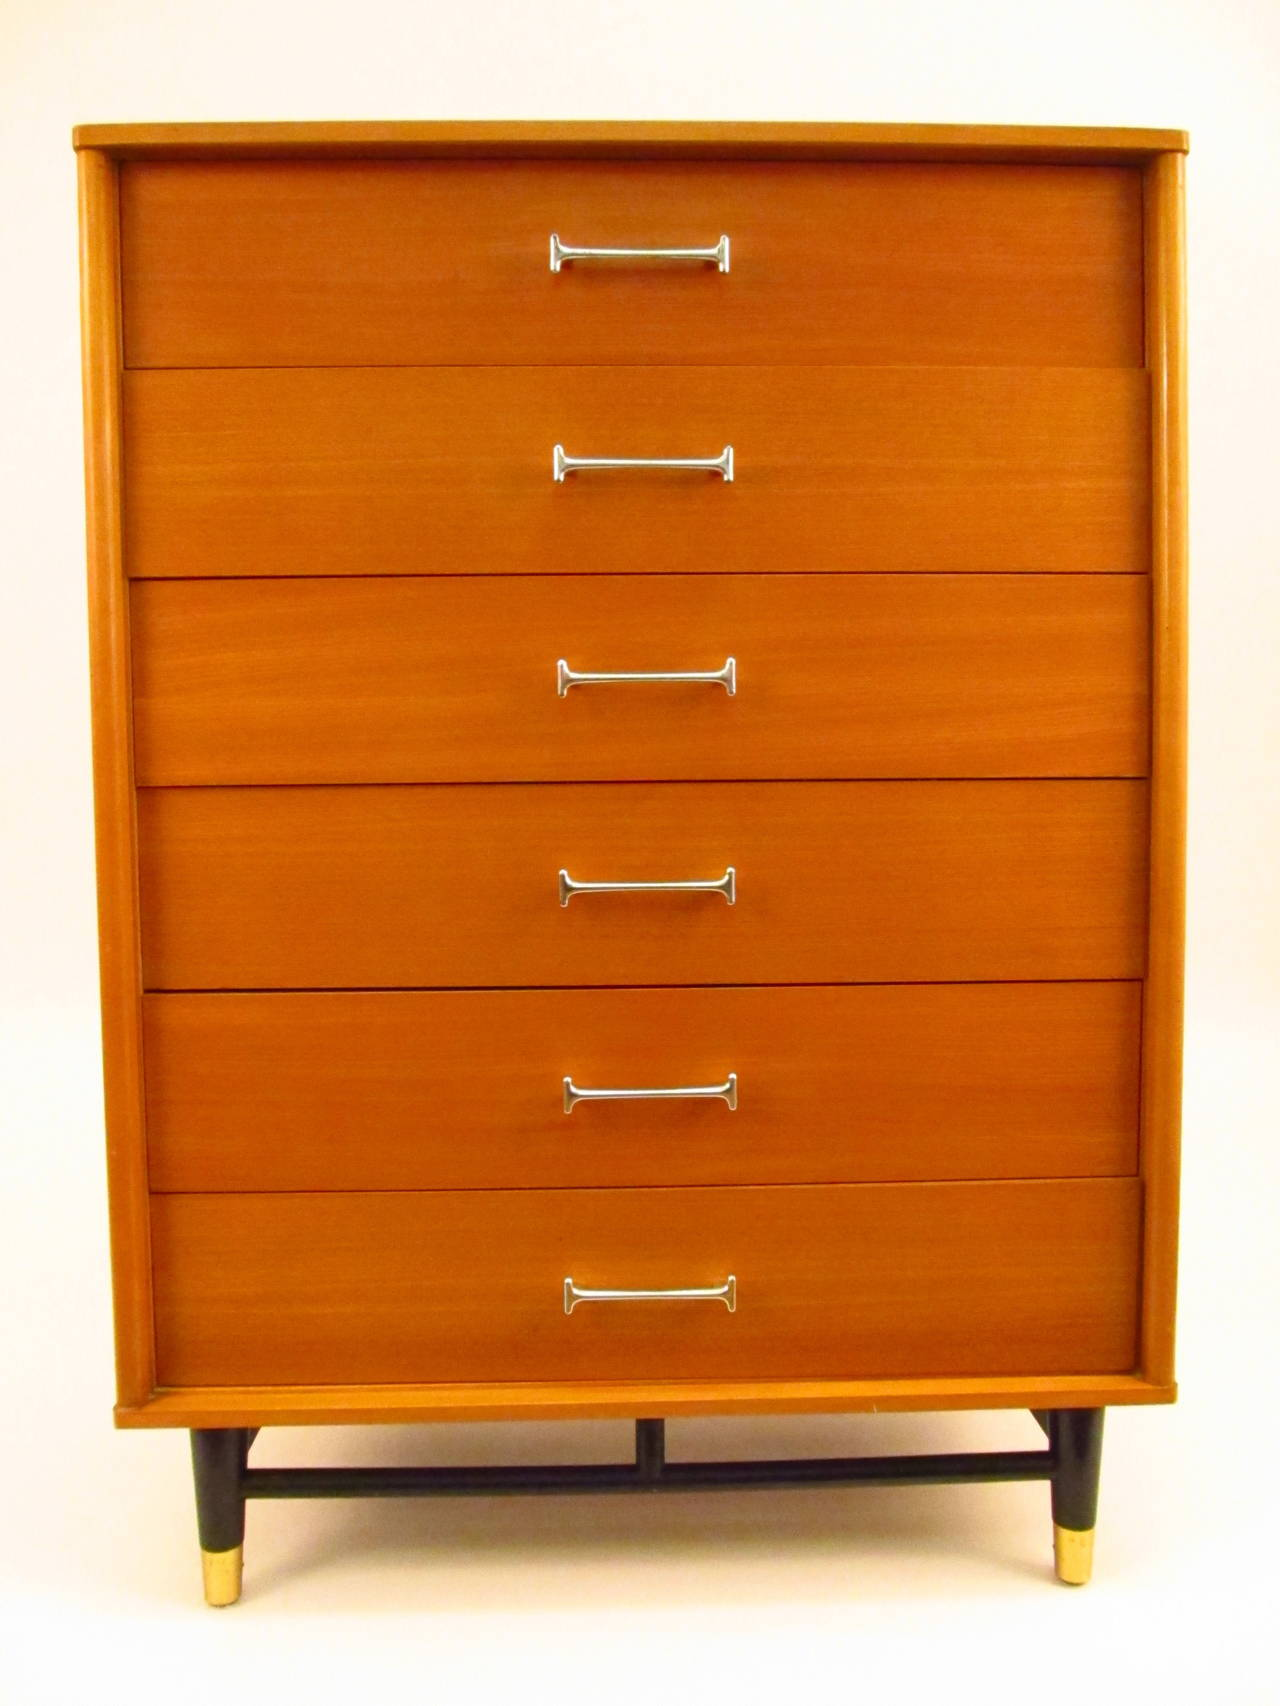 Pair Of 1950s Drexel Blonde Wood Highboy Dressers At 1stdibs